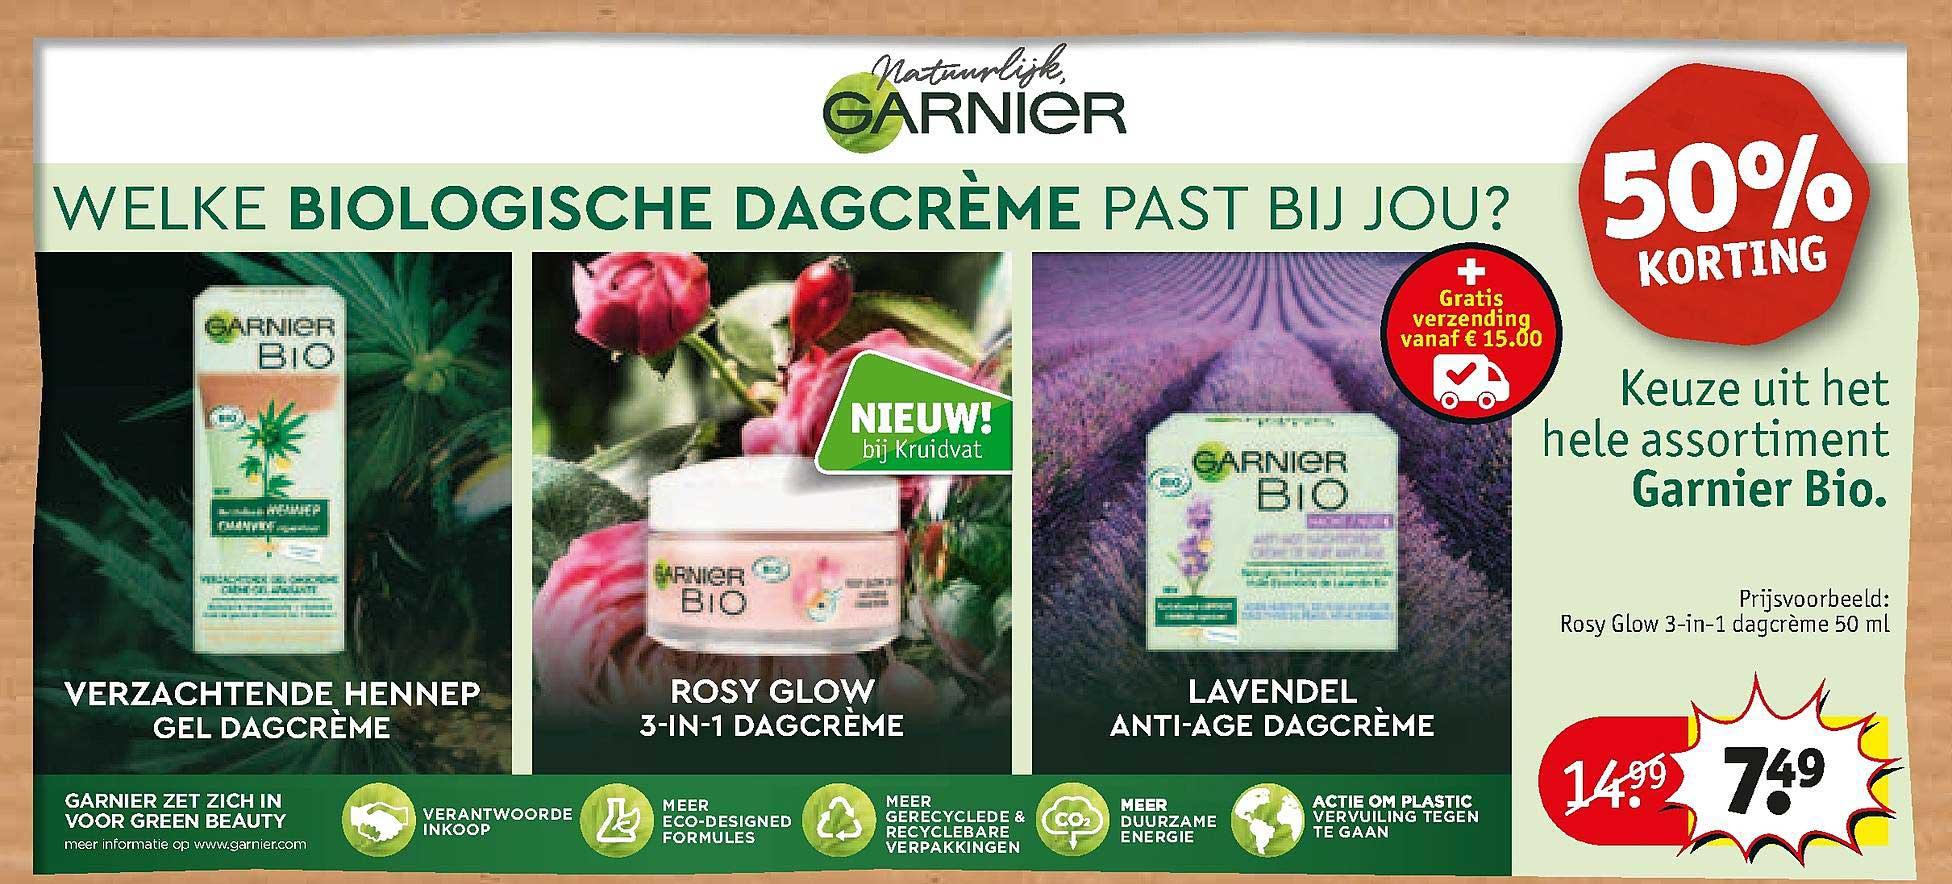 Kruidvat Garnier Bio Verzachtende Hennep Gel Dagdreme, Rosy Glow 3-In-1 Dagcreme, Lavendel Anti-Age Dagcreme